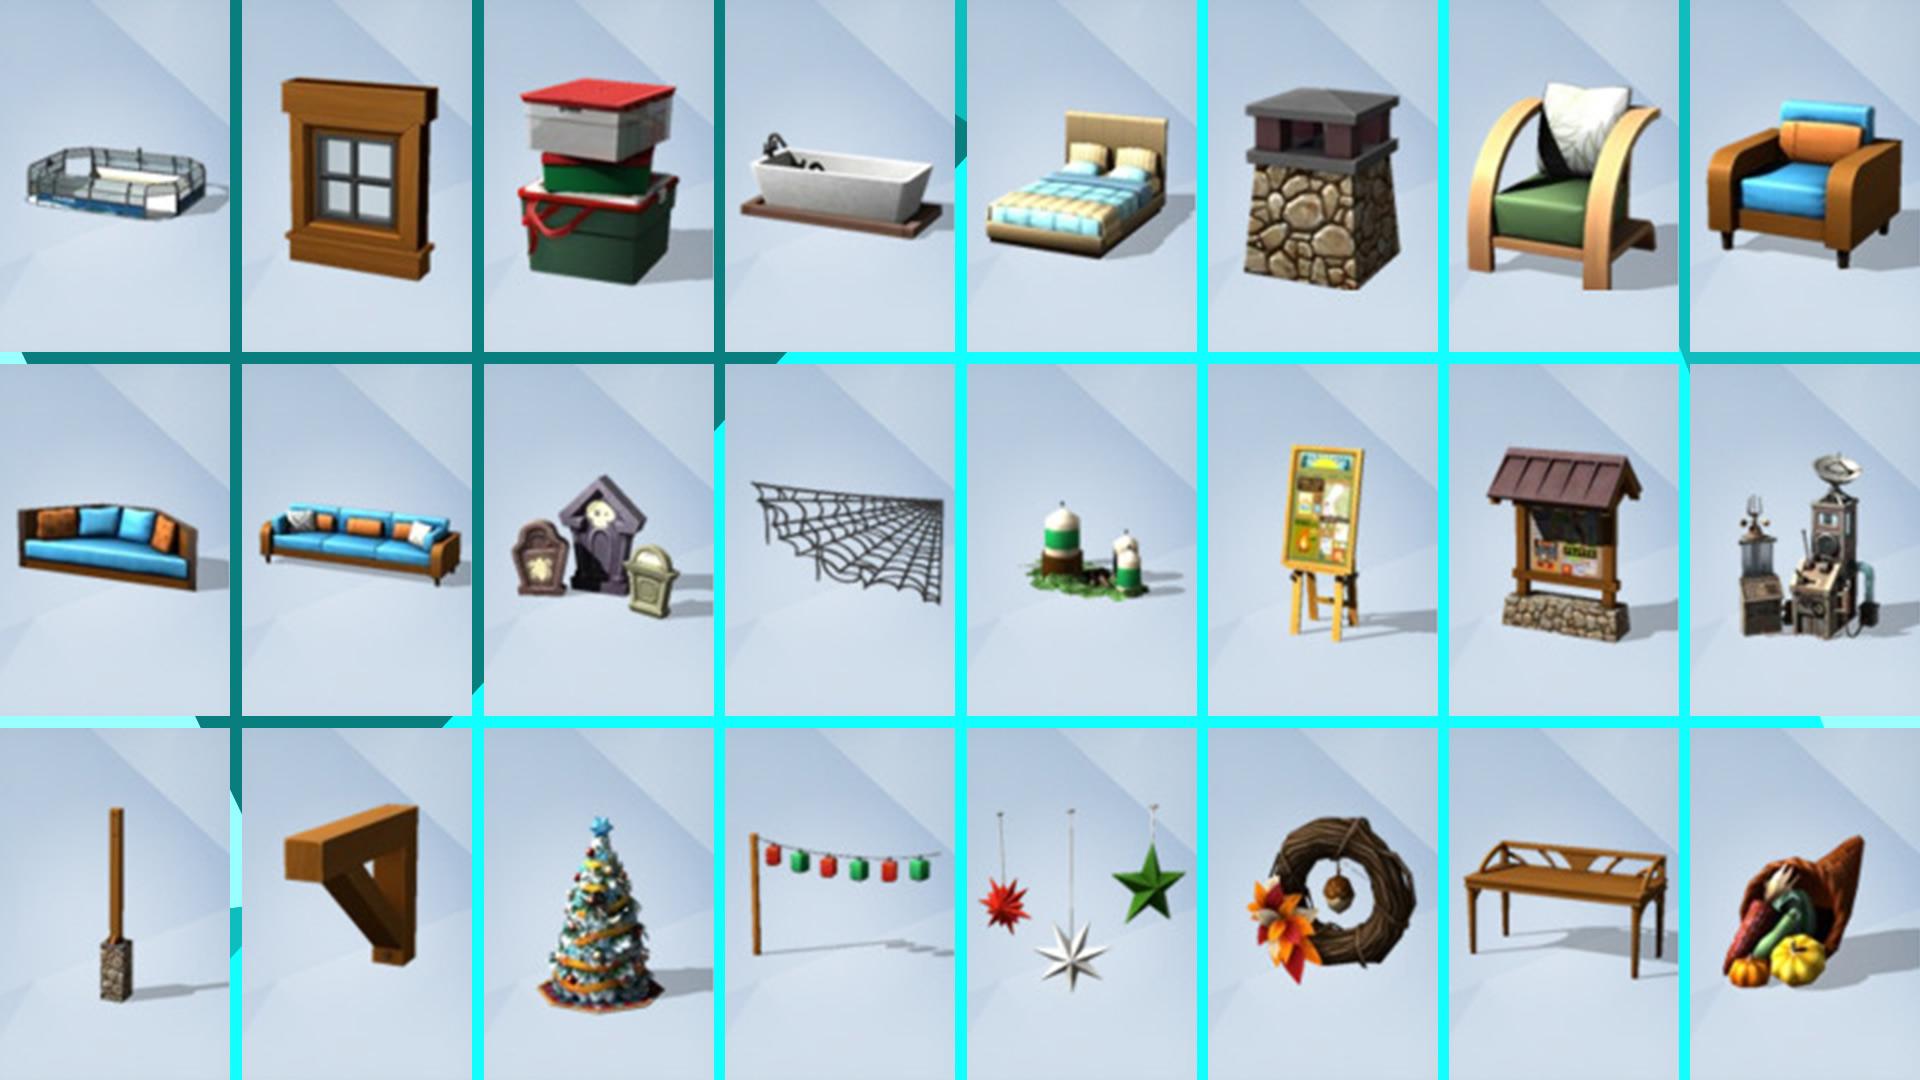 Скриншот №3 к The Sims 4 Времена года